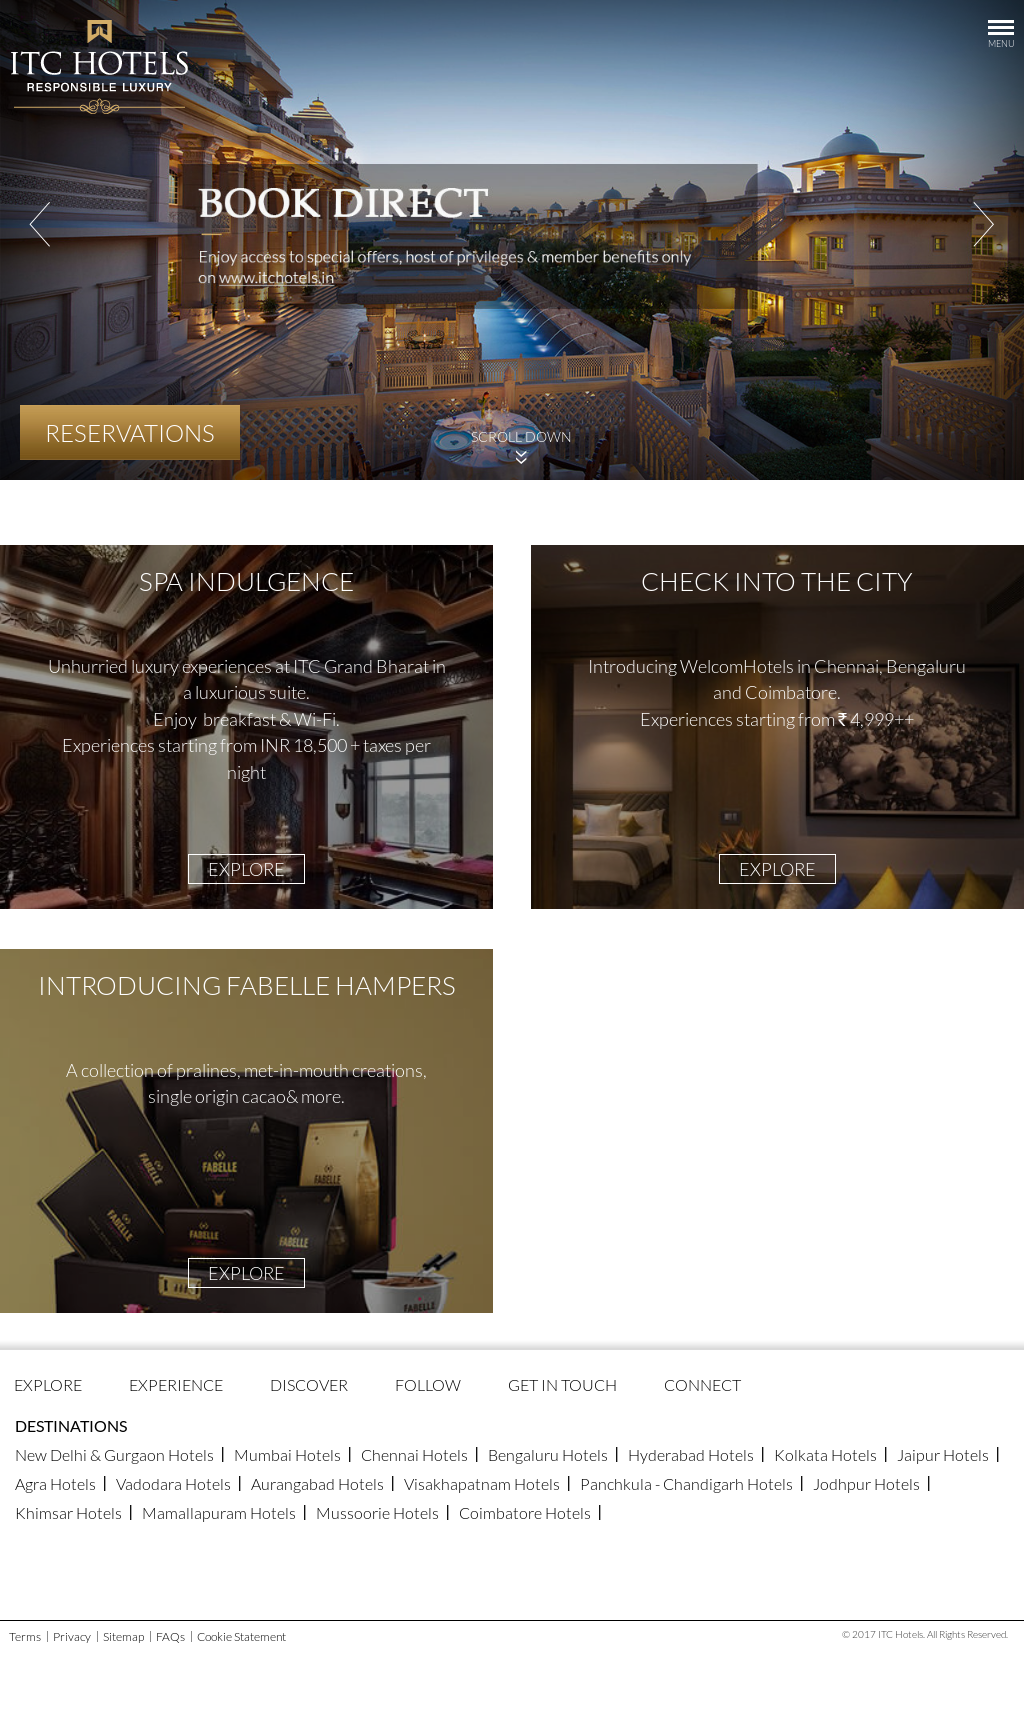 Itc Hotels Website History